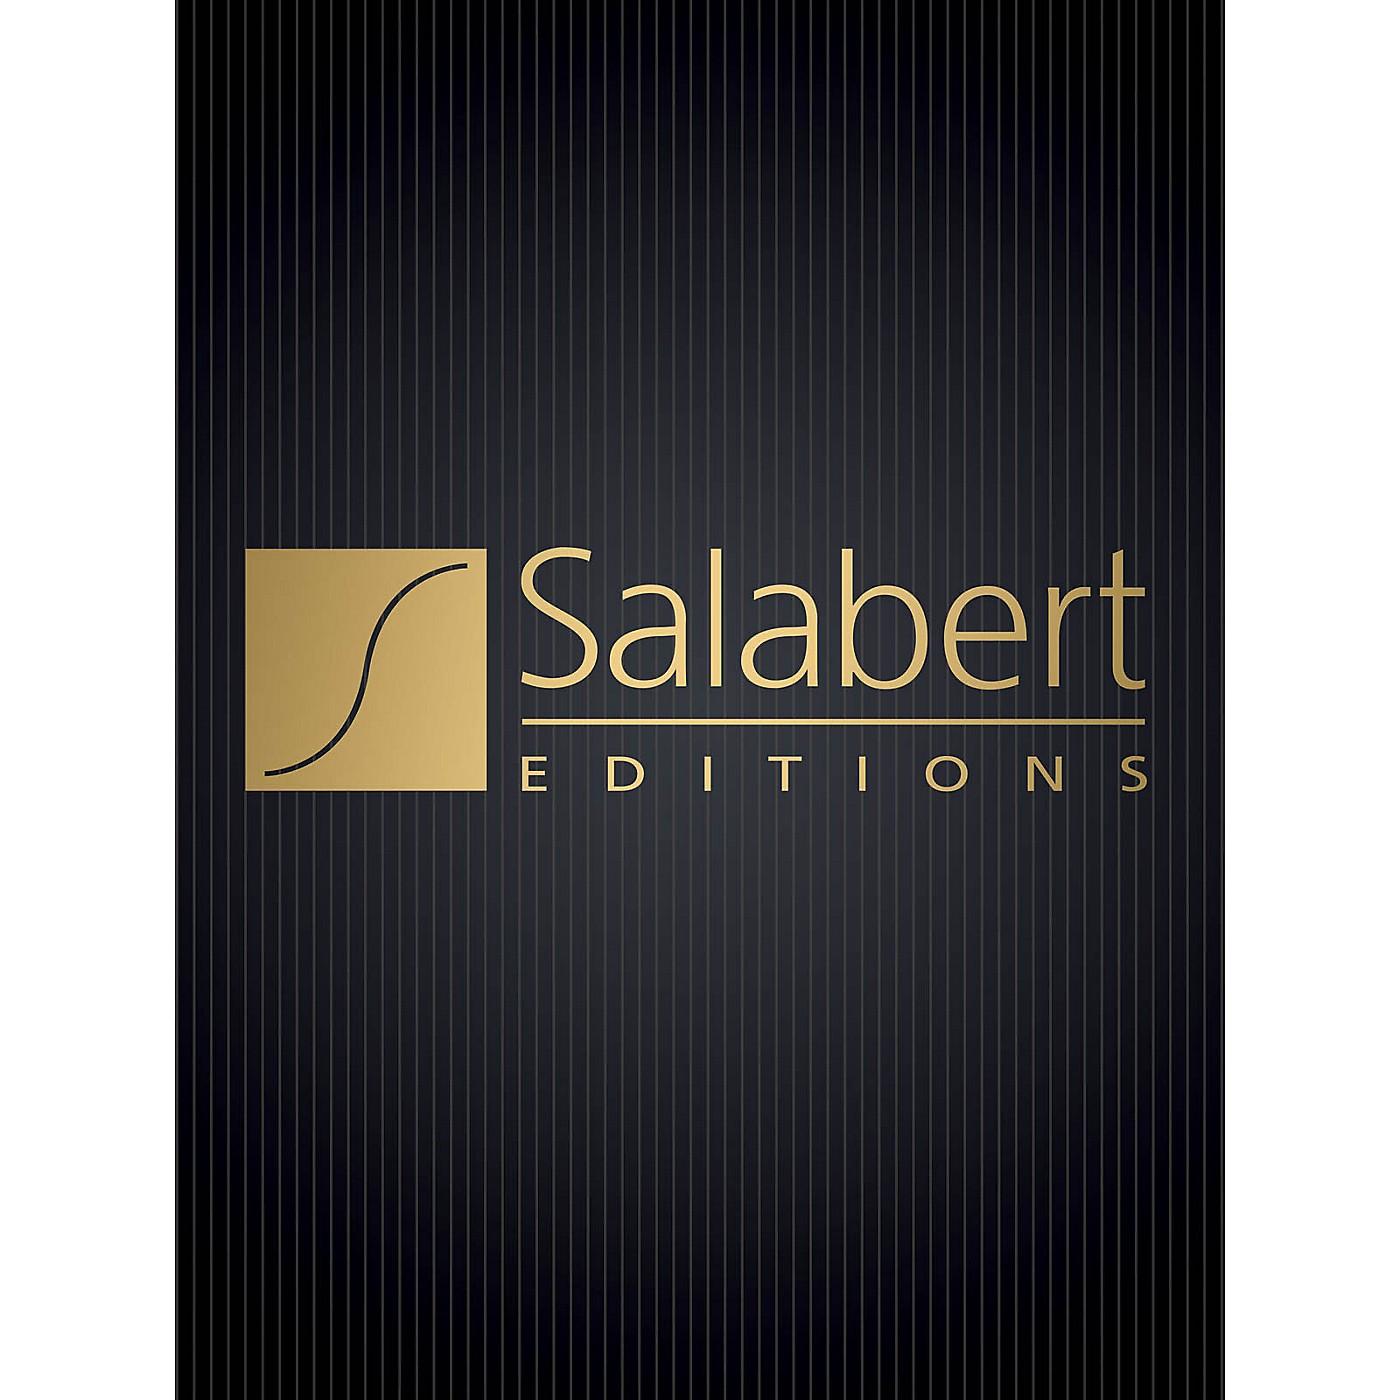 Hal Leonard Piano Sonate (sonata) No. 9 G Major Piano Series Softcover thumbnail